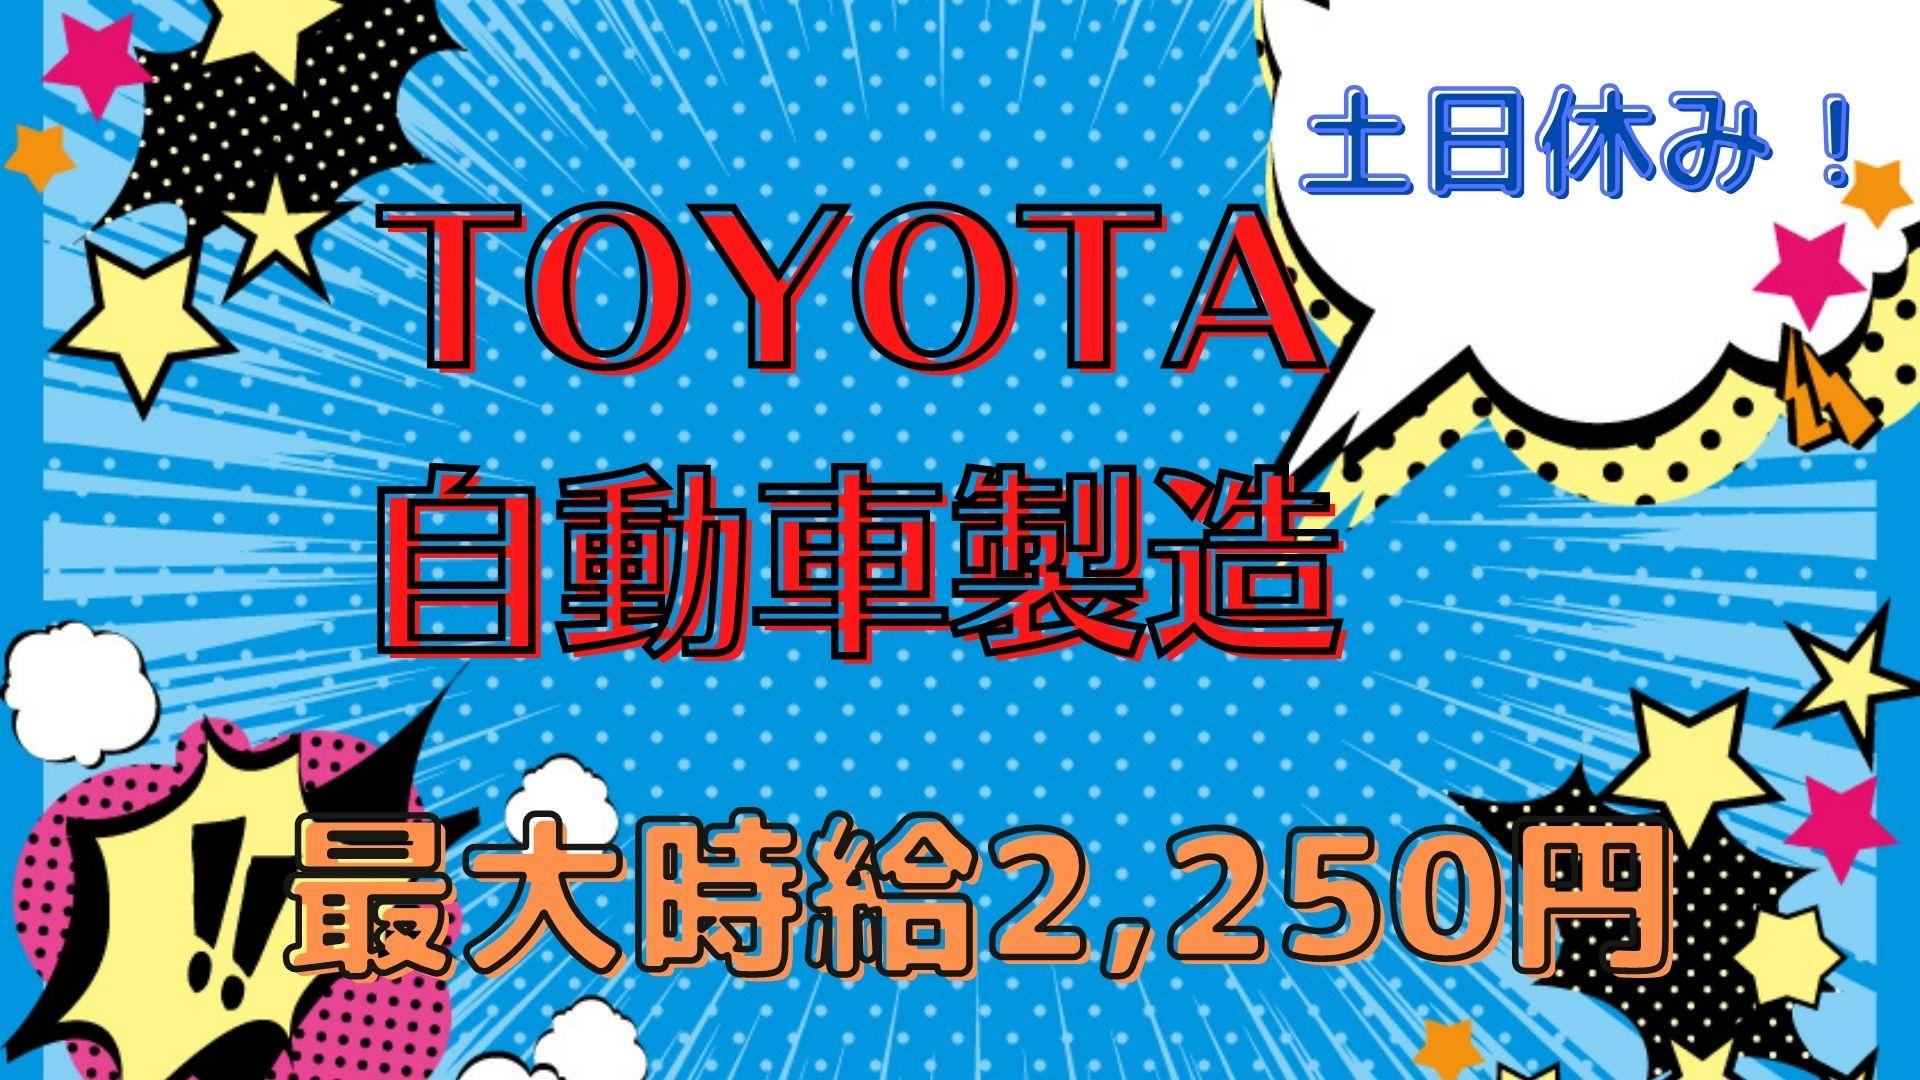 【新設】正社員登用希望者コース/自動車製造スタッフ